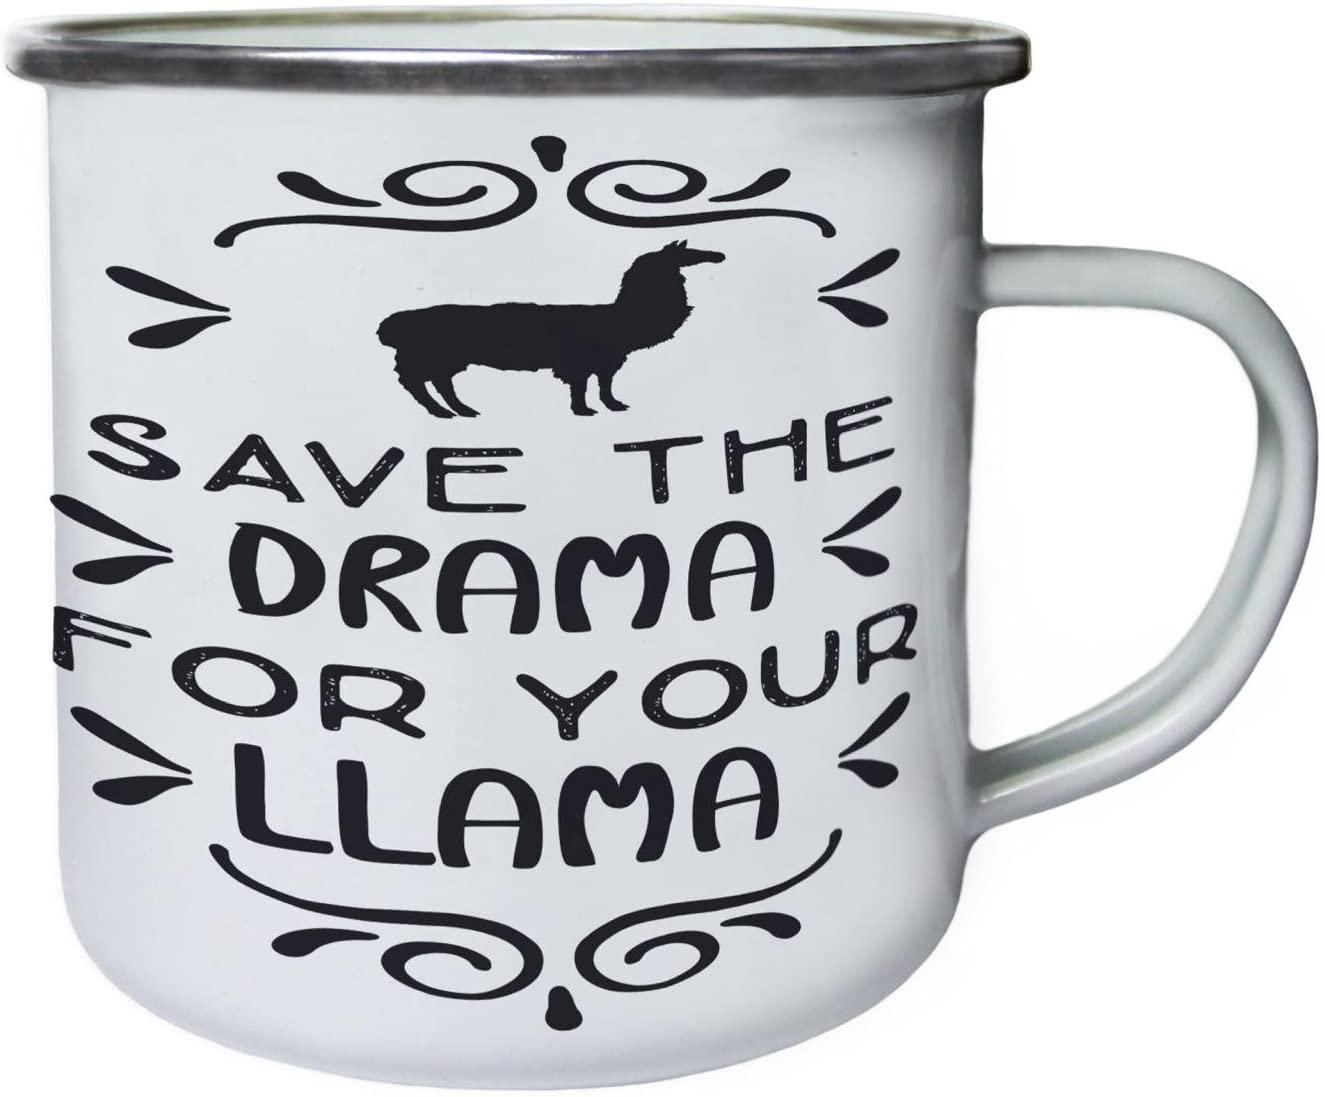 Save The Drama For Your Llama Retro,Tin, Enamel 10oz Mug n821e